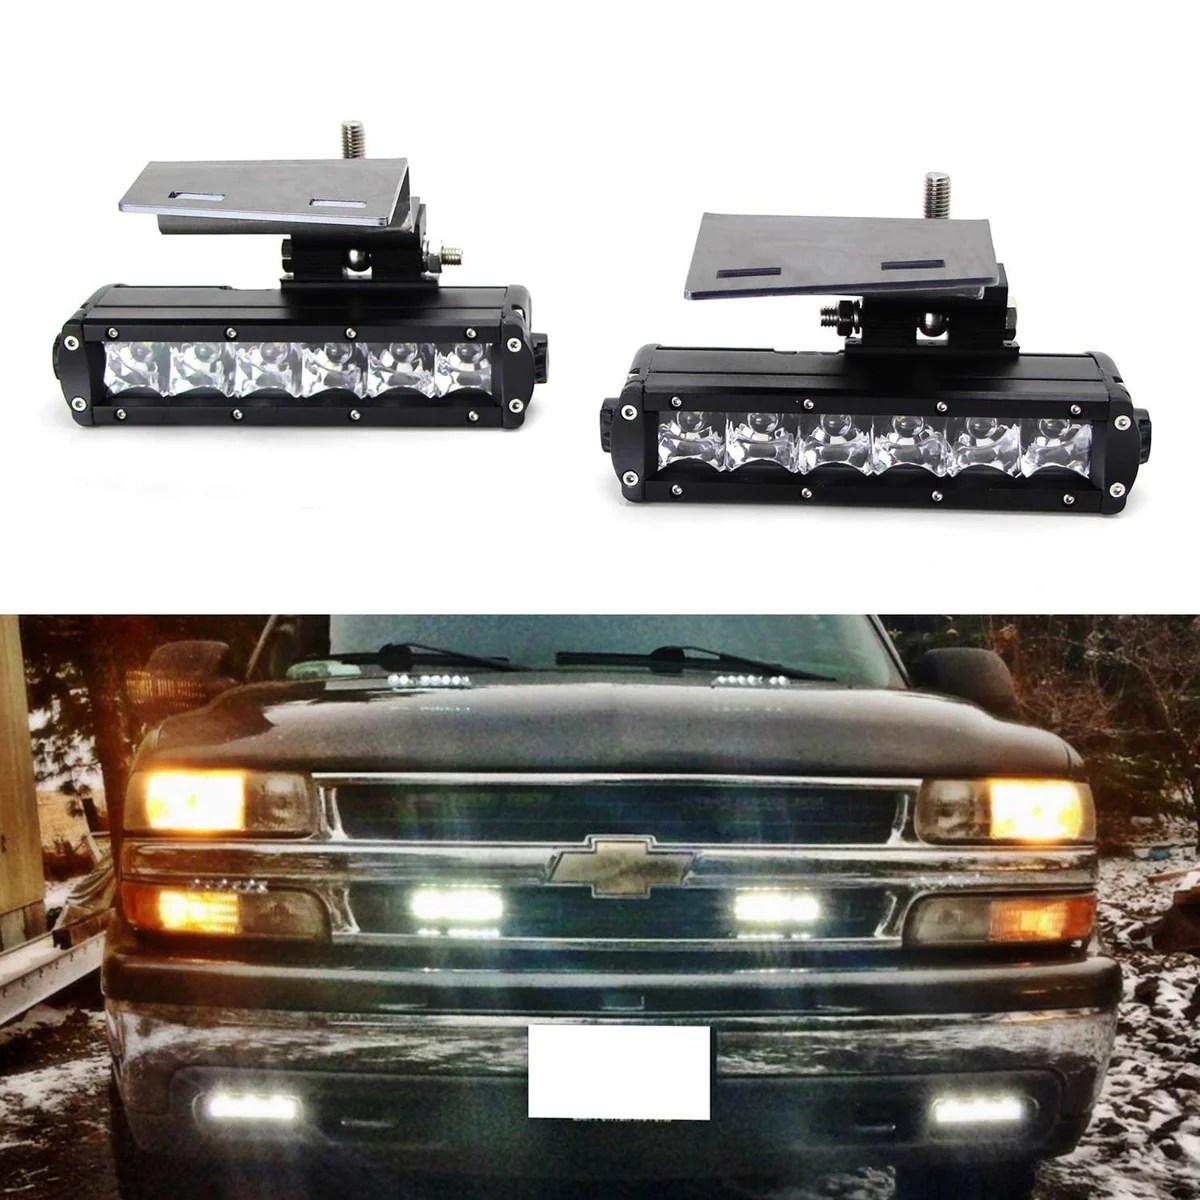 hight resolution of led light bar fog lamps kit for 99 02 chevrolet silverado 1500 2500 00 01 3500 00 2006 suburban tahoe includes 2 30w cree led light bars